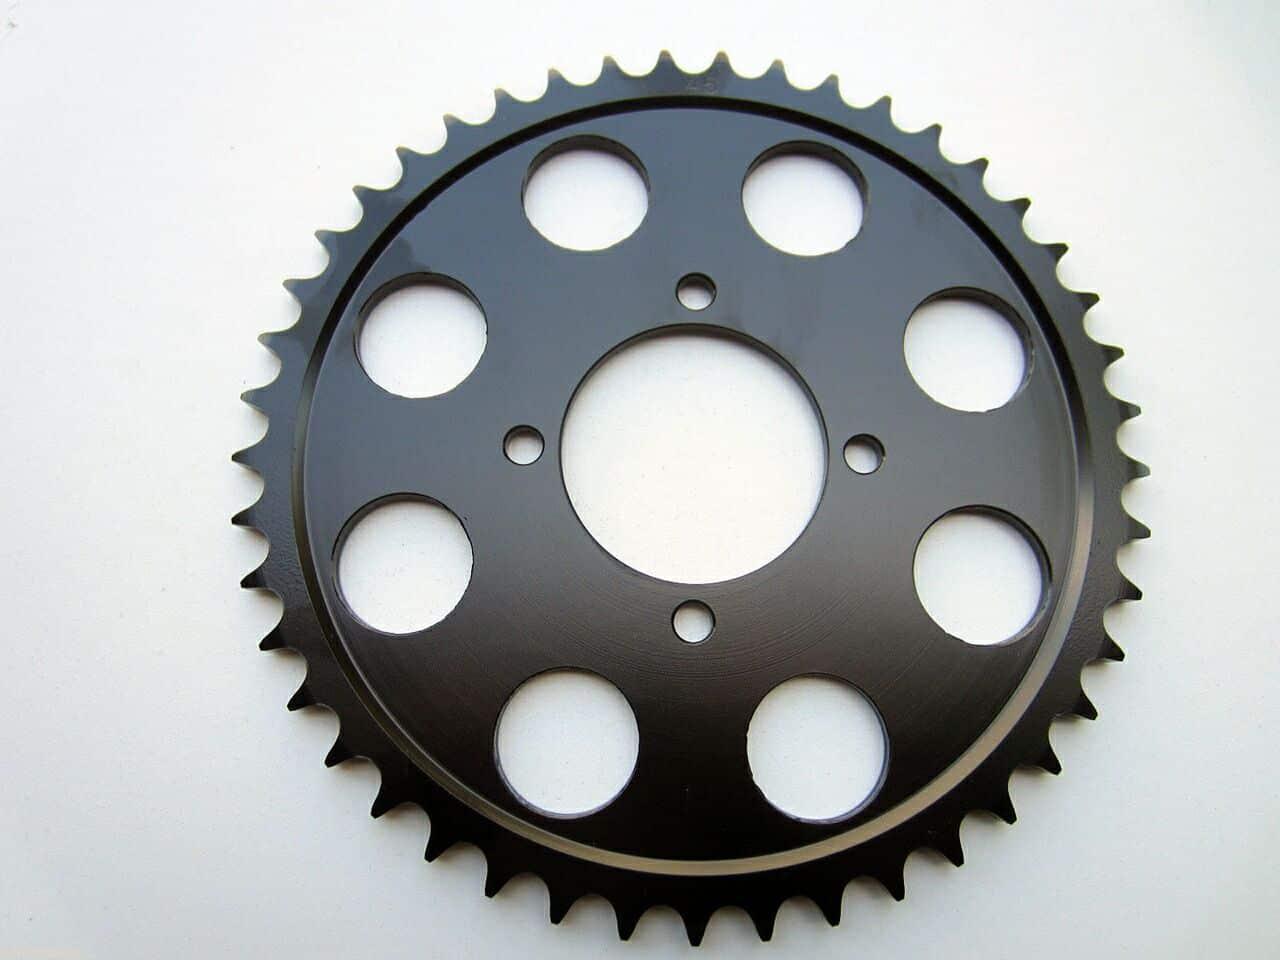 377072 Triumph T140 disc brake rear sprocket 45T - Classic Bike Spares